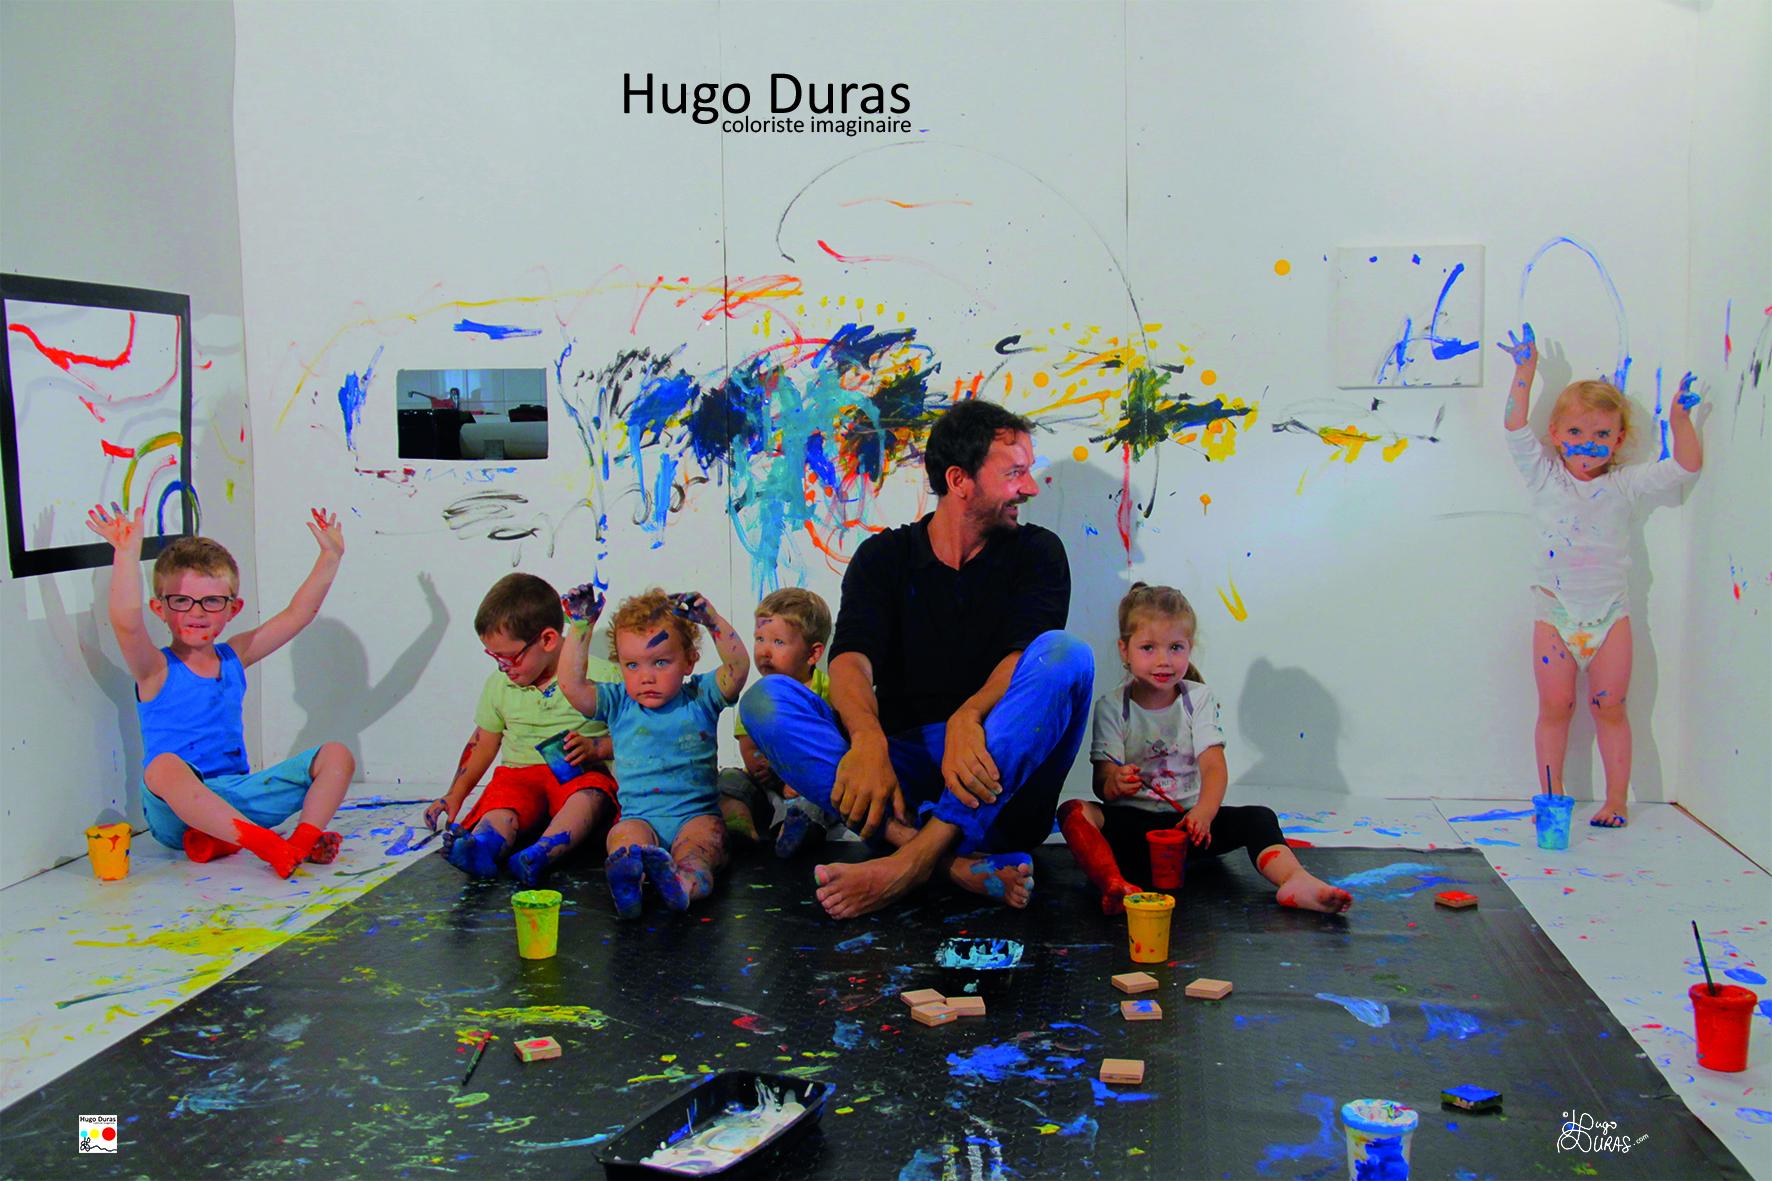 Hugo Duras